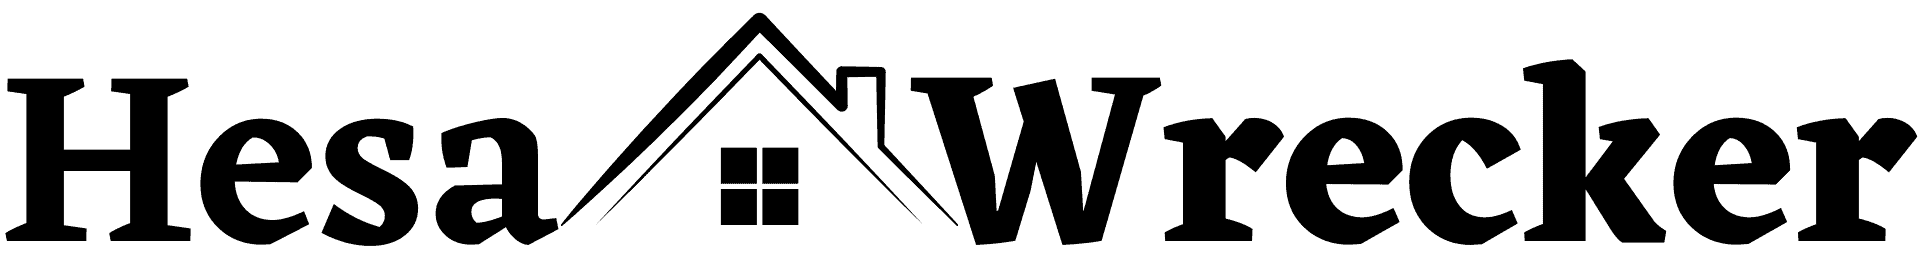 Hesahomewrecker